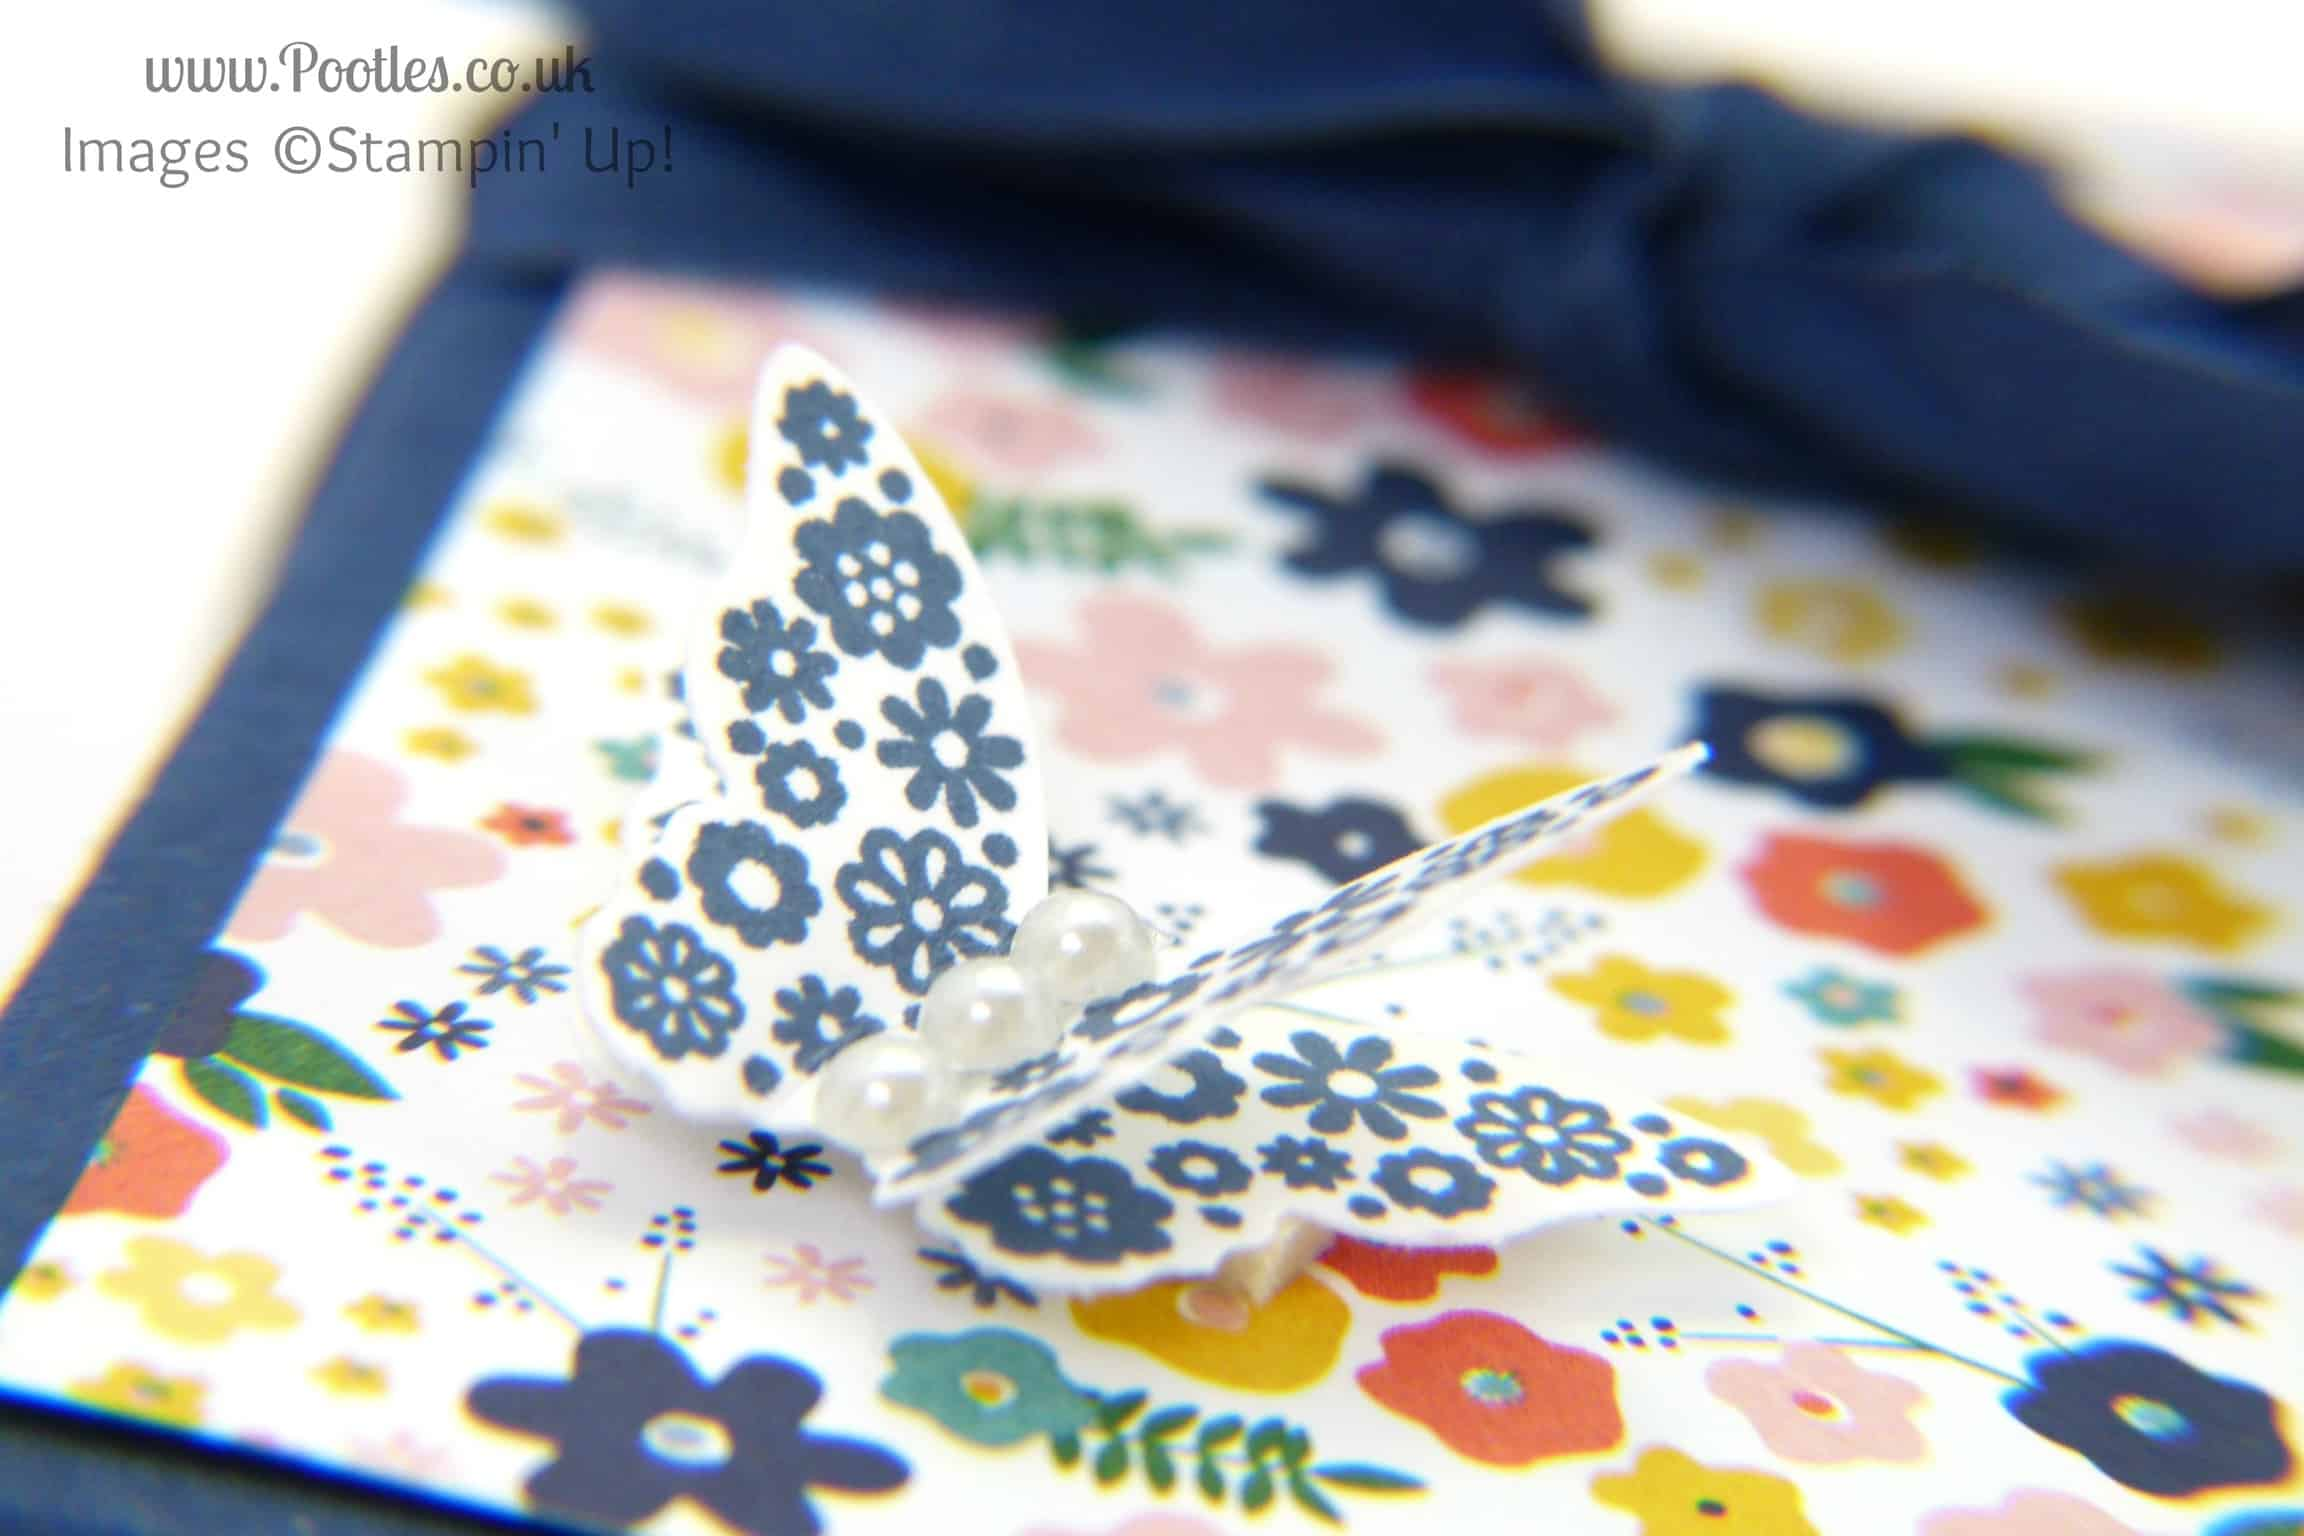 Stampin' Up! UK Demonstrator Pootles - 3 2 1 Box Tutorial using Stampin' Up Supplies butterfly detail